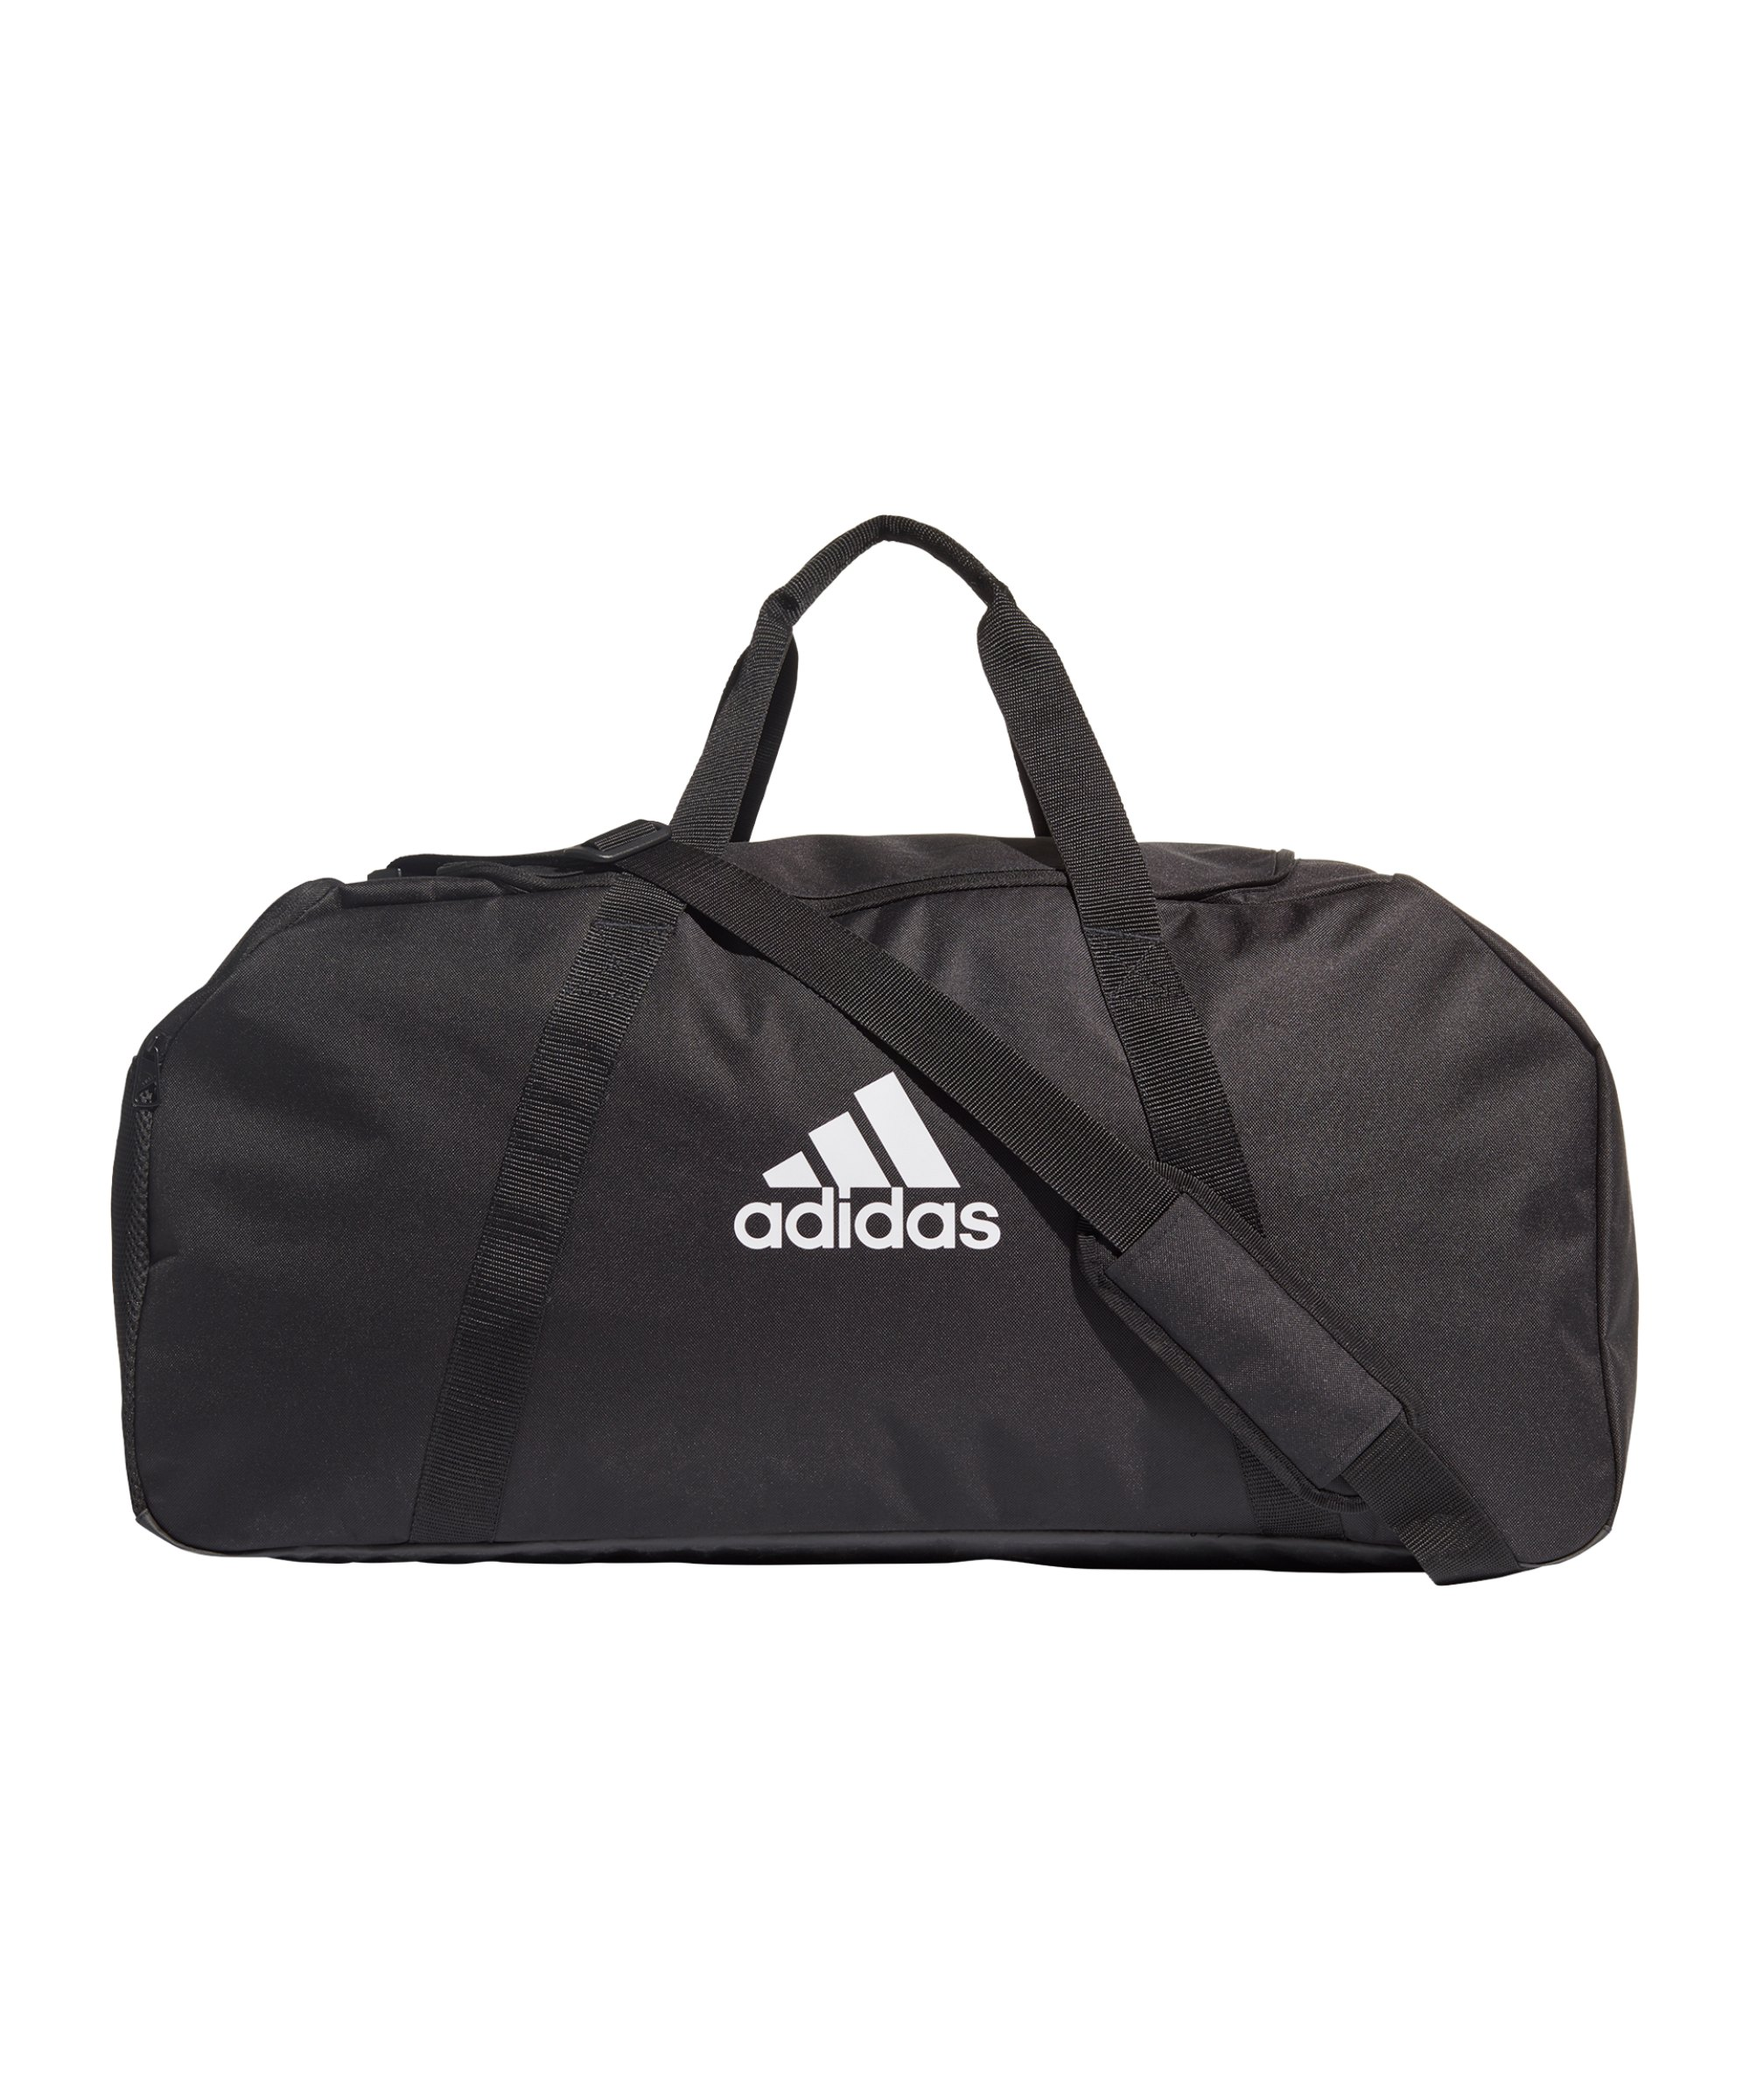 adidas Tiro Duffle Bag Gr. L Schwarz Weiss - schwarz